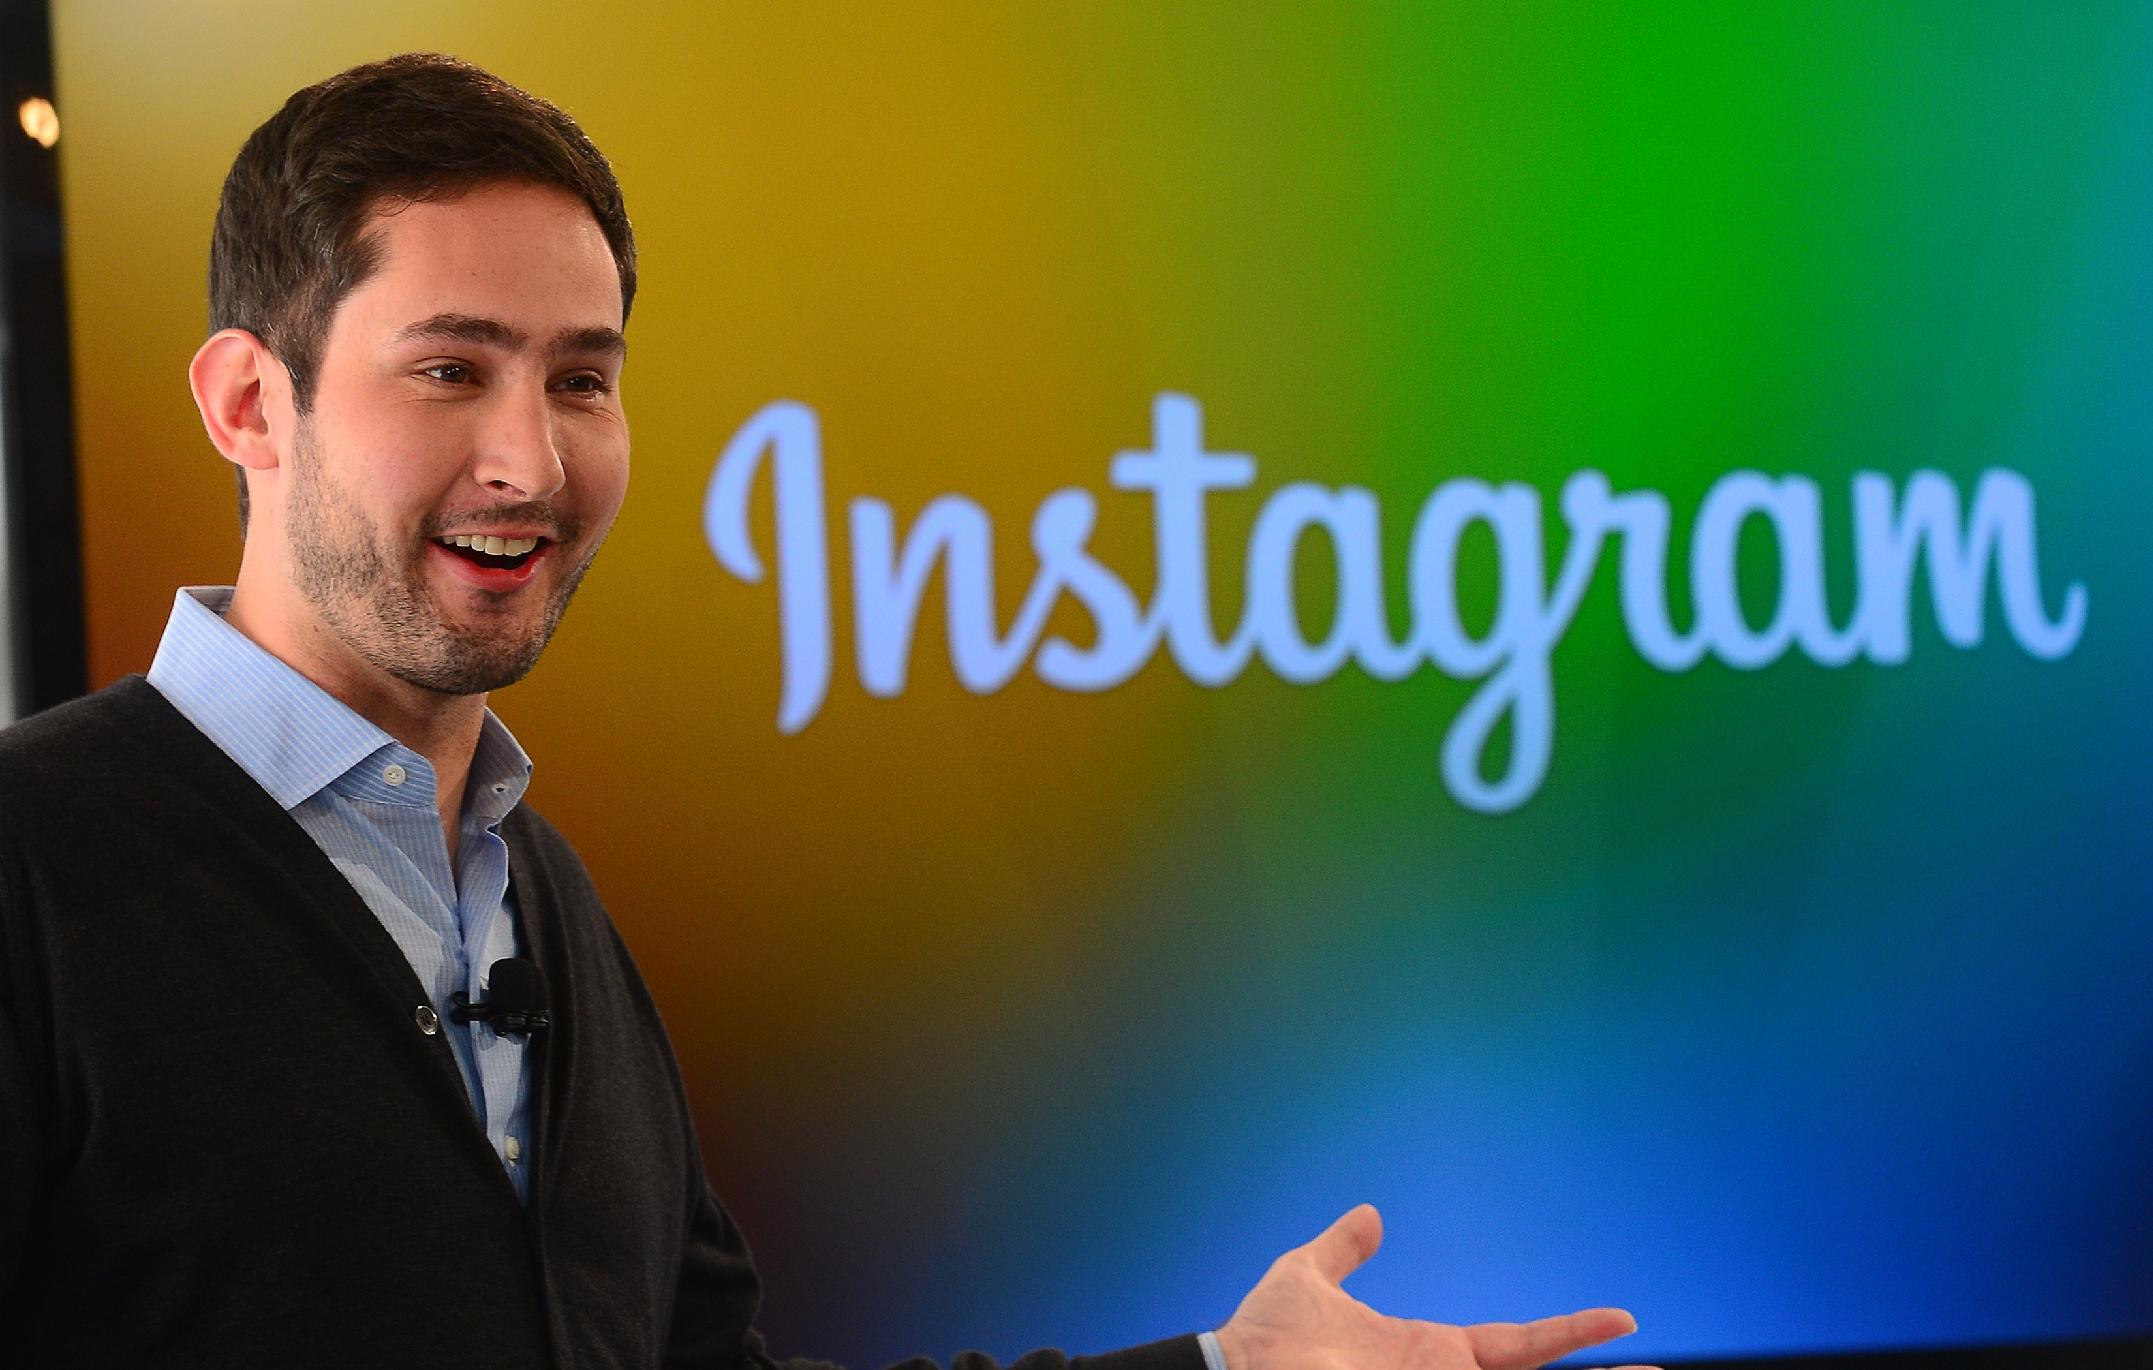 Instagram hits 300 million users, passes Twitter